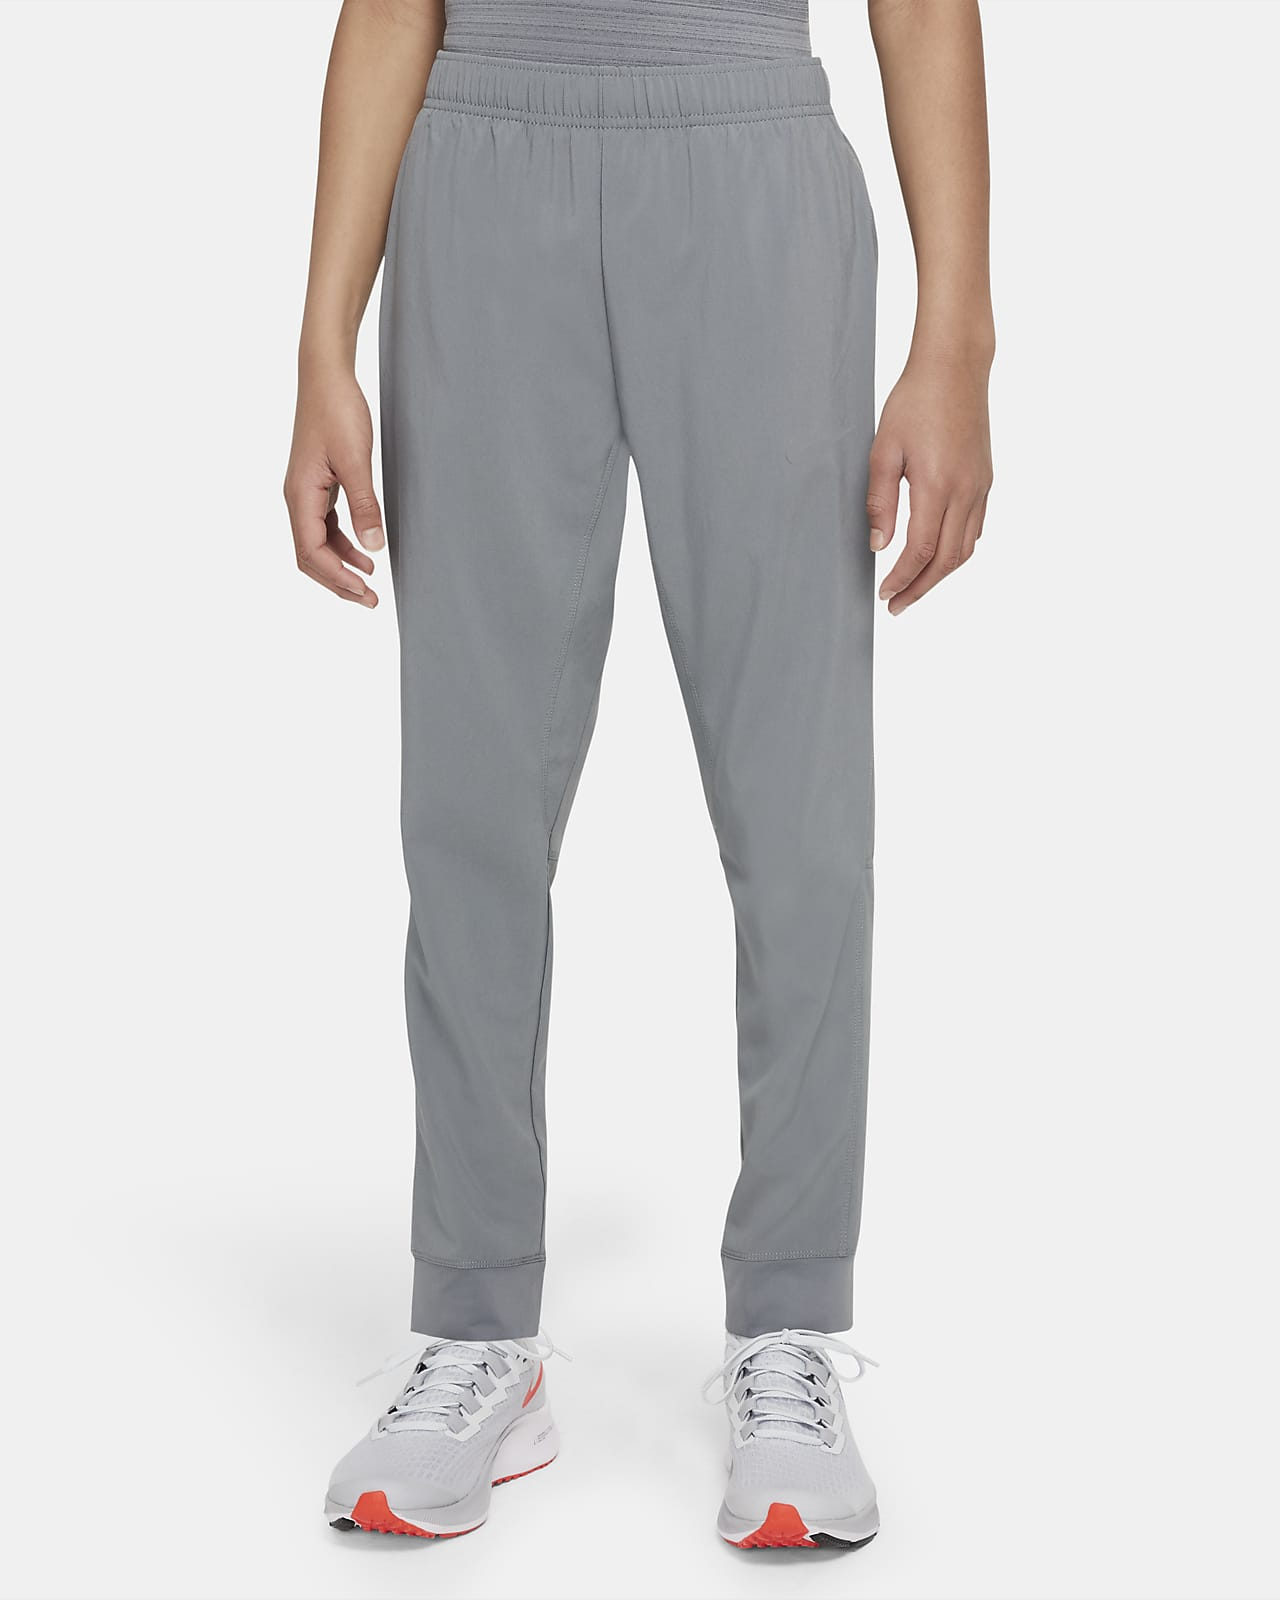 Nike Dri-FIT Older Kids' (Boys') Woven Training Trousers